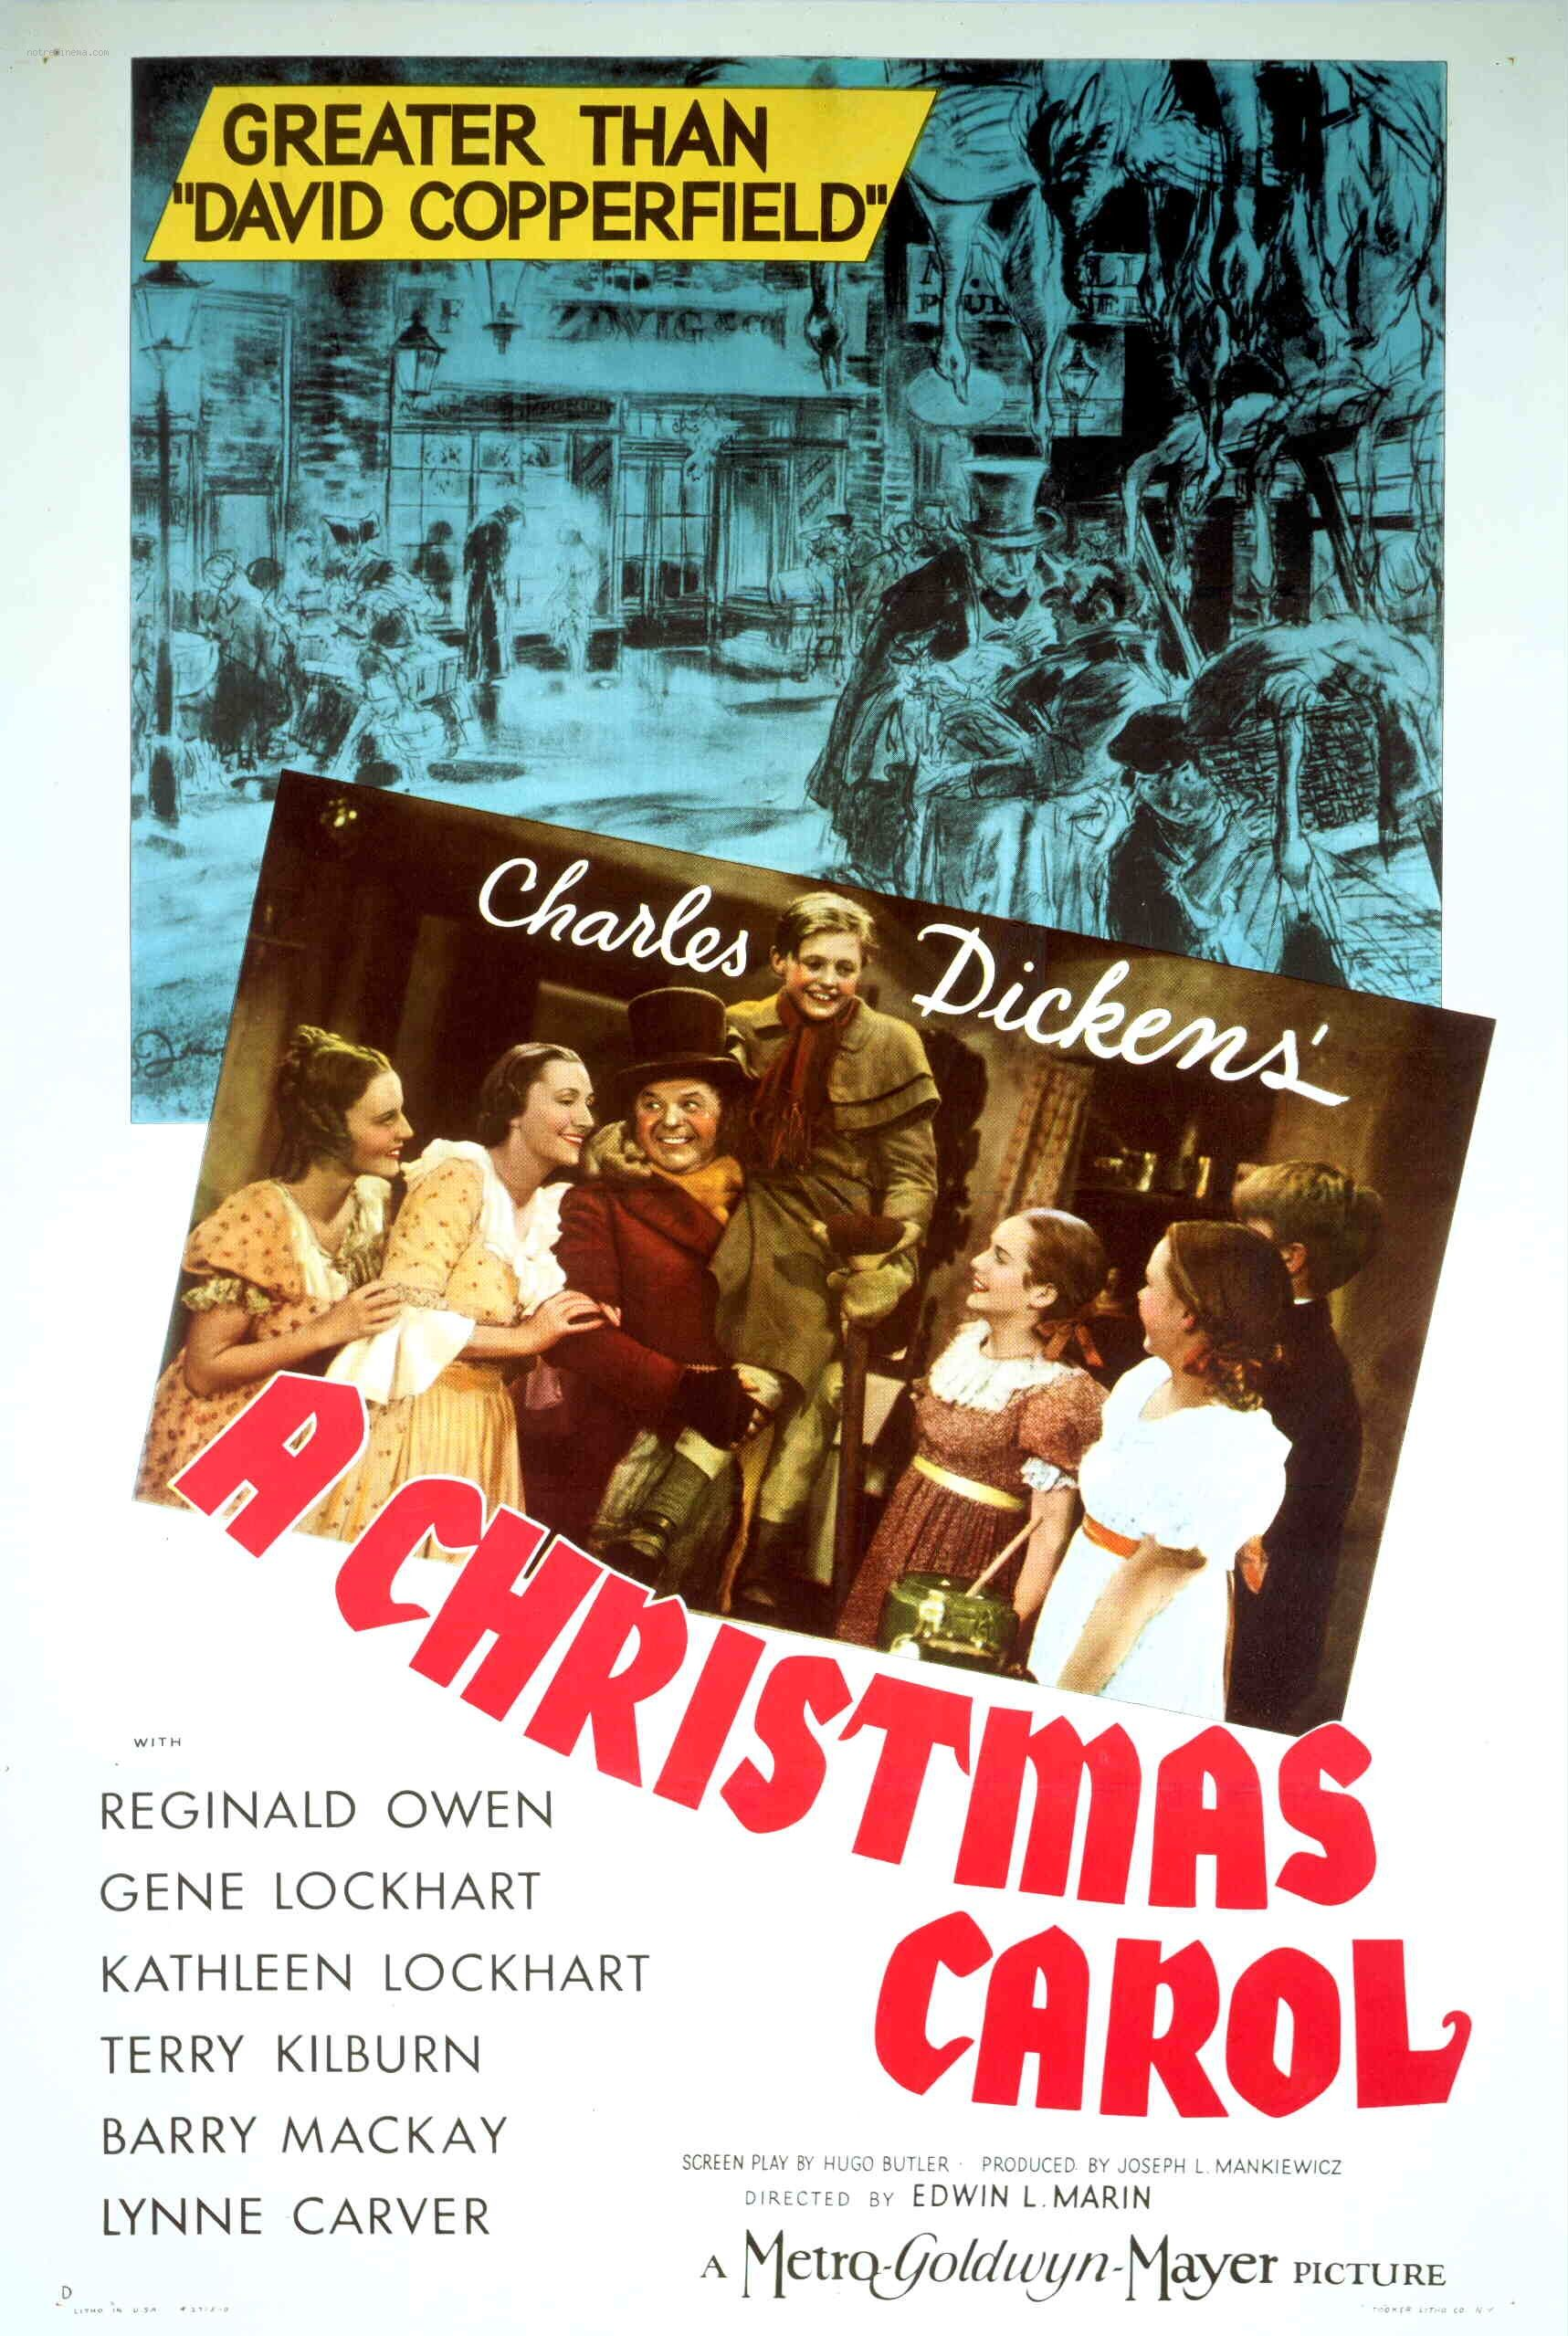 A Christmas Carol (1938) starring Reginald Owen, Gene